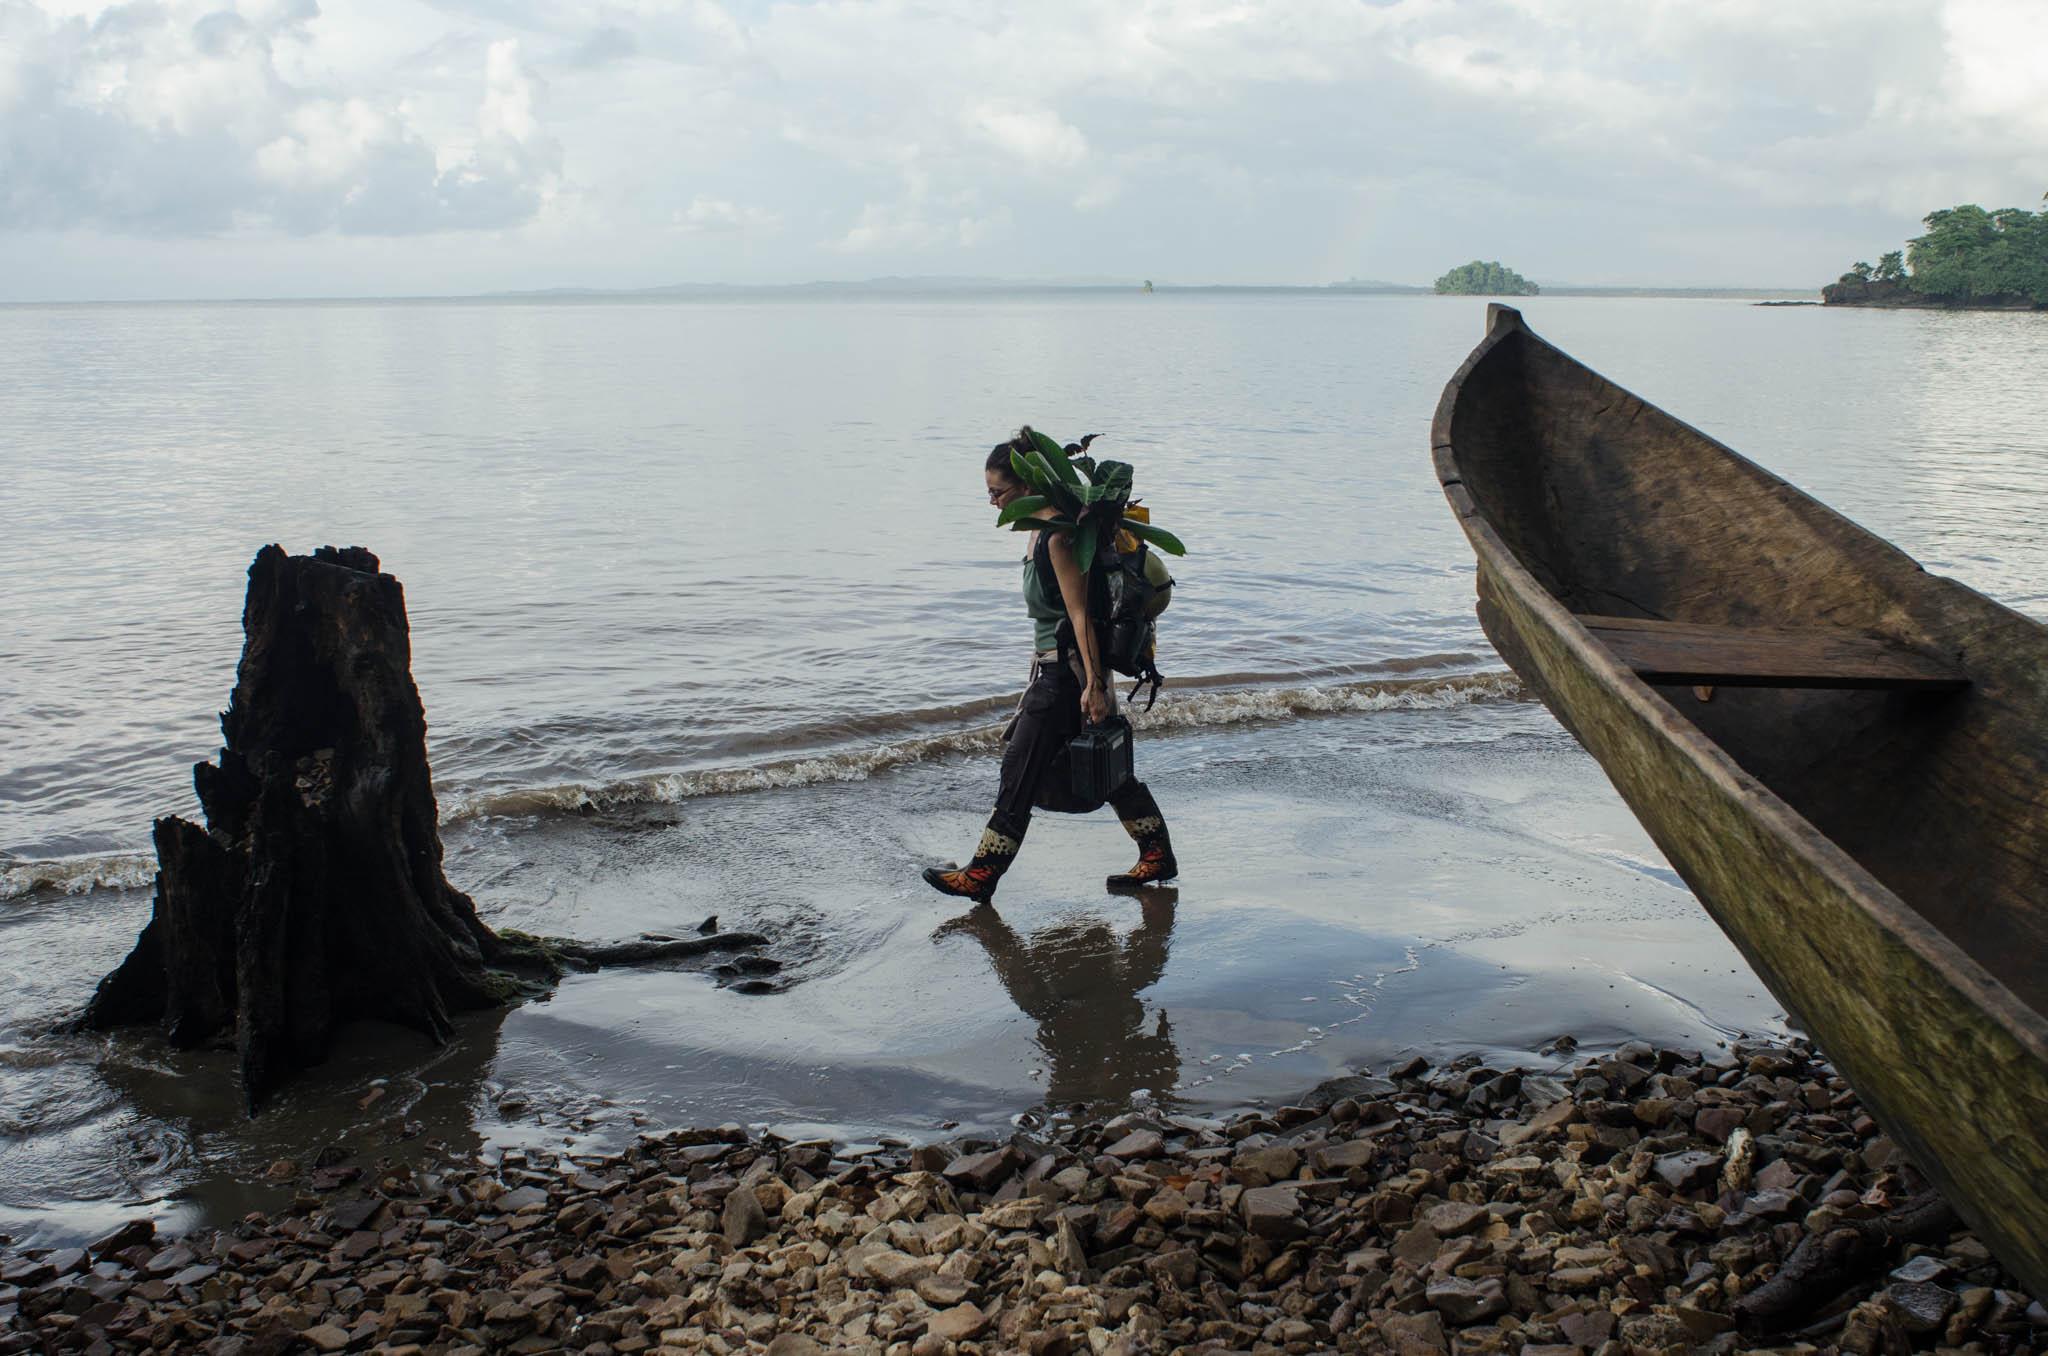 Martina Luger, Climate Specialist HorizonT 3000 & blueEnergy, walks on the beach at Bangkukuk - photo, Tom Miller